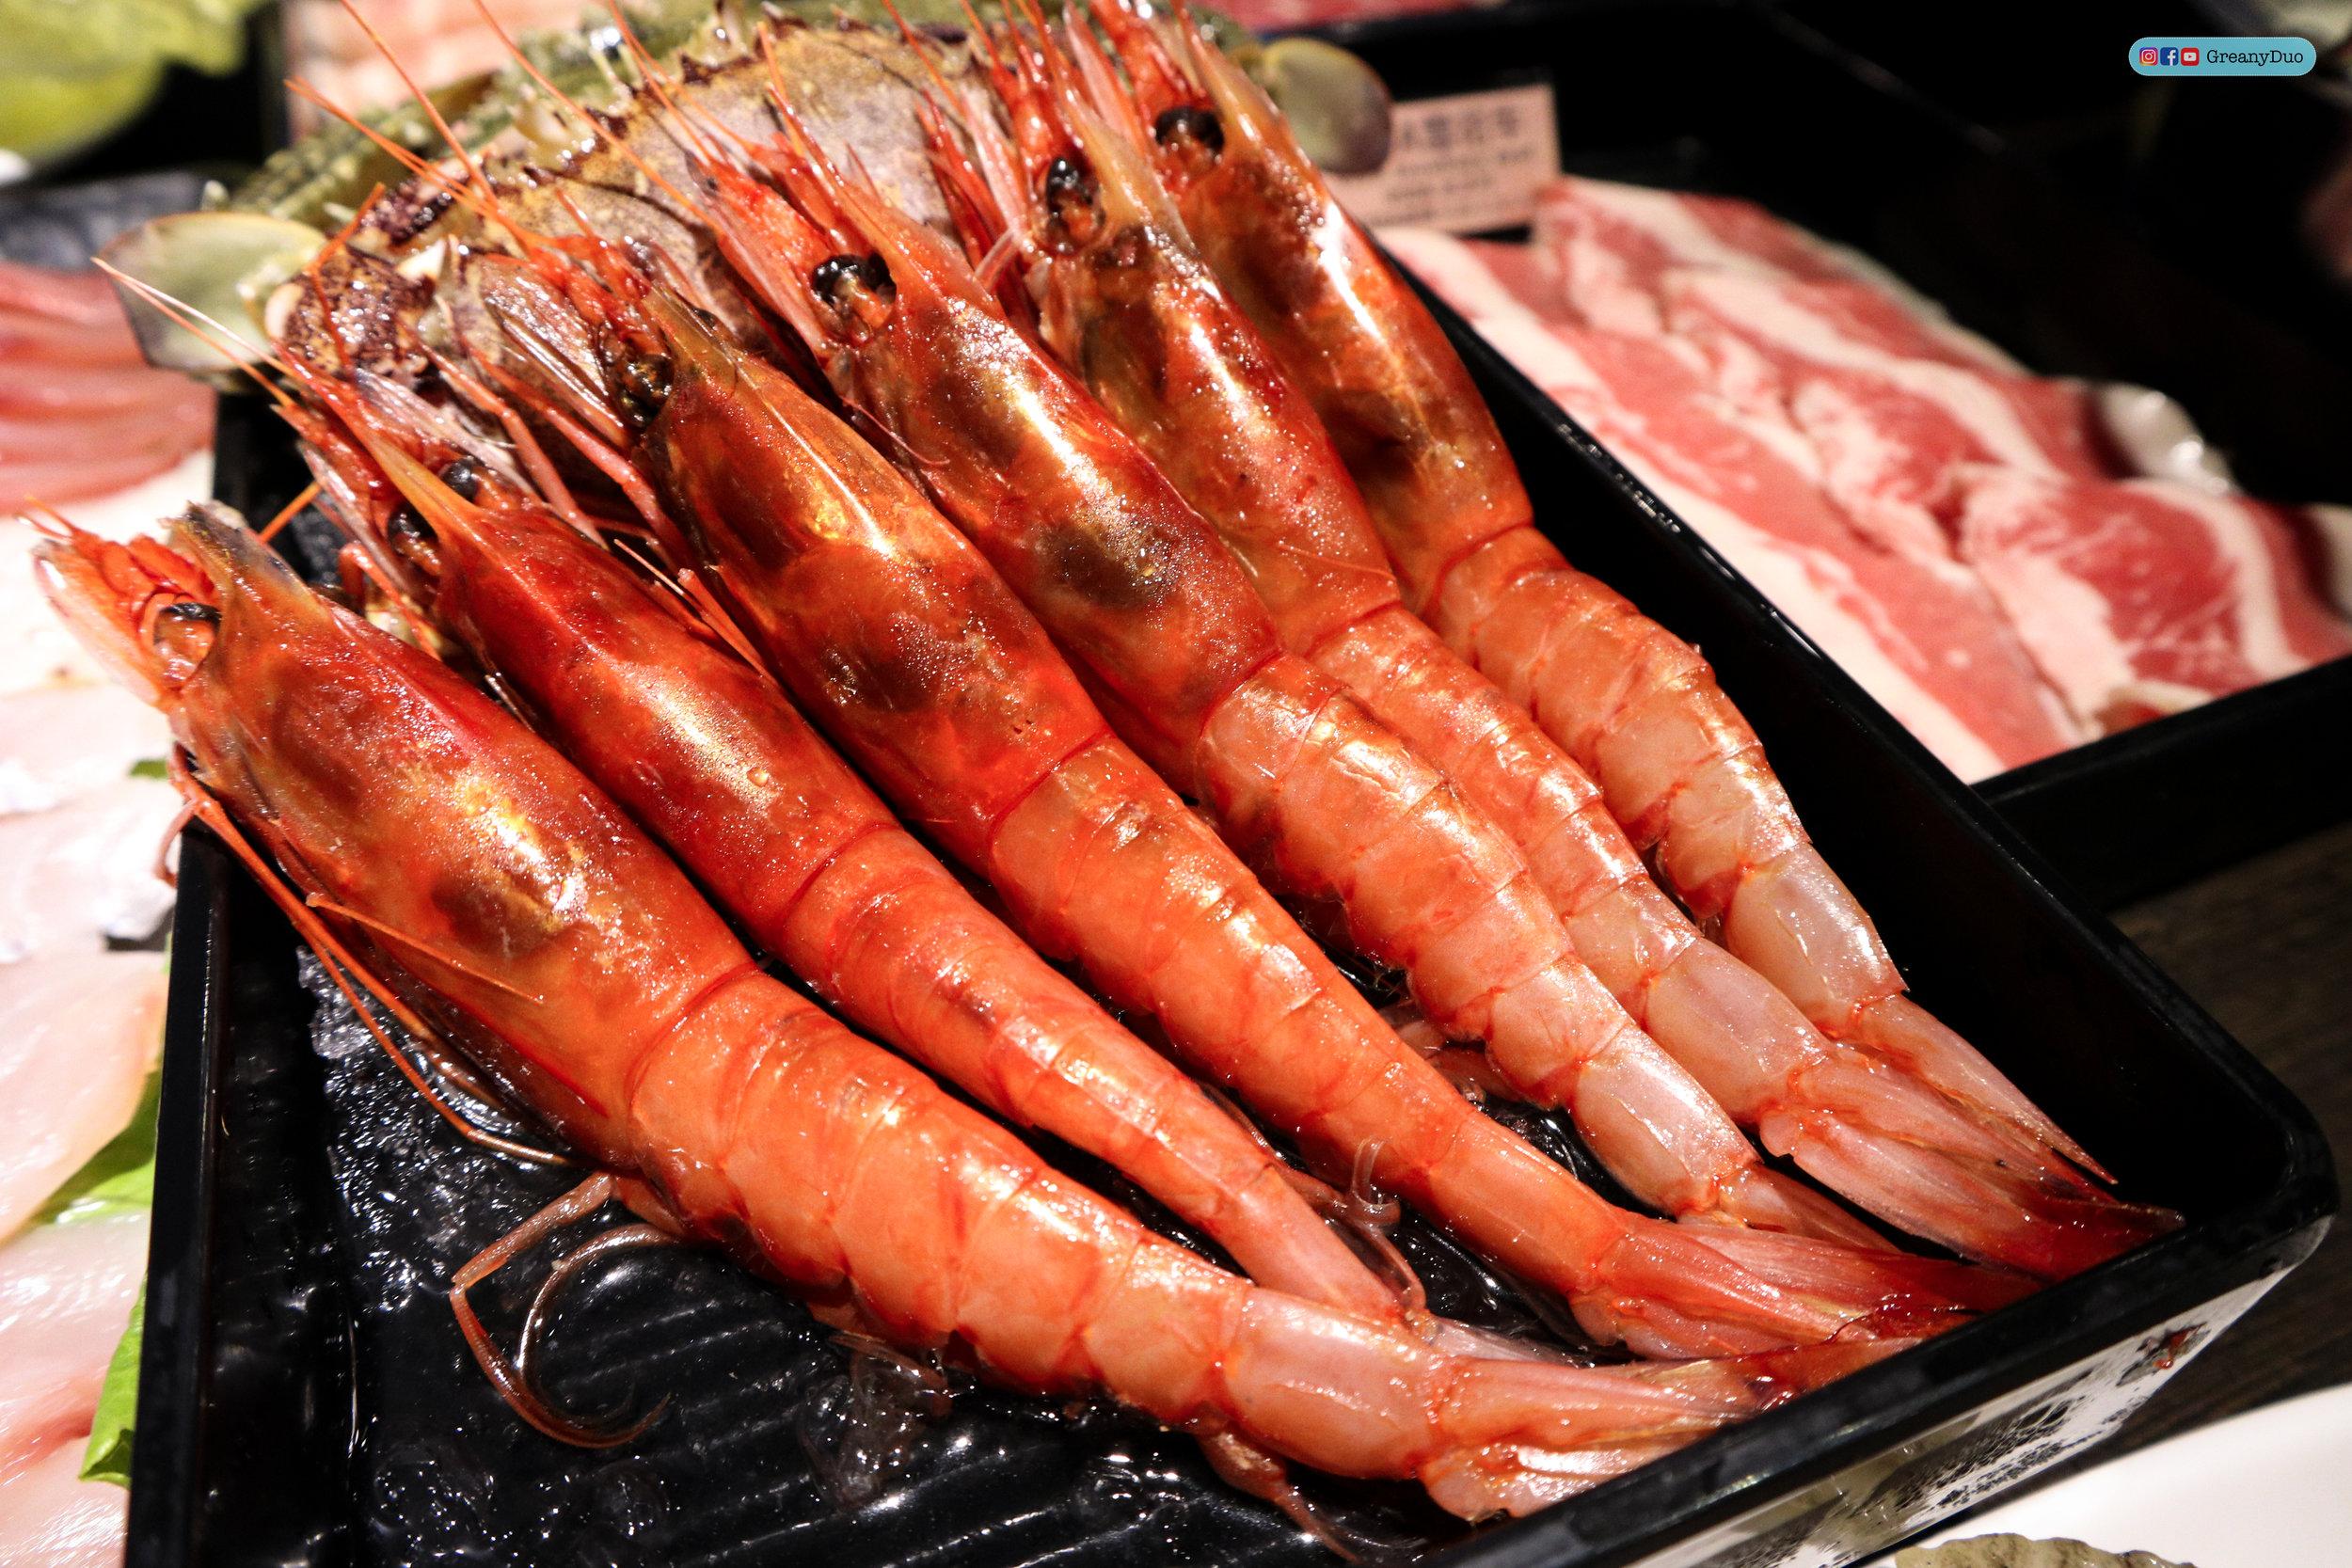 special shrimps at บุฟเฟ่ต์ชาบูไต้หวันที่ Hakkai Shabu Shabu ซีเหมินติง